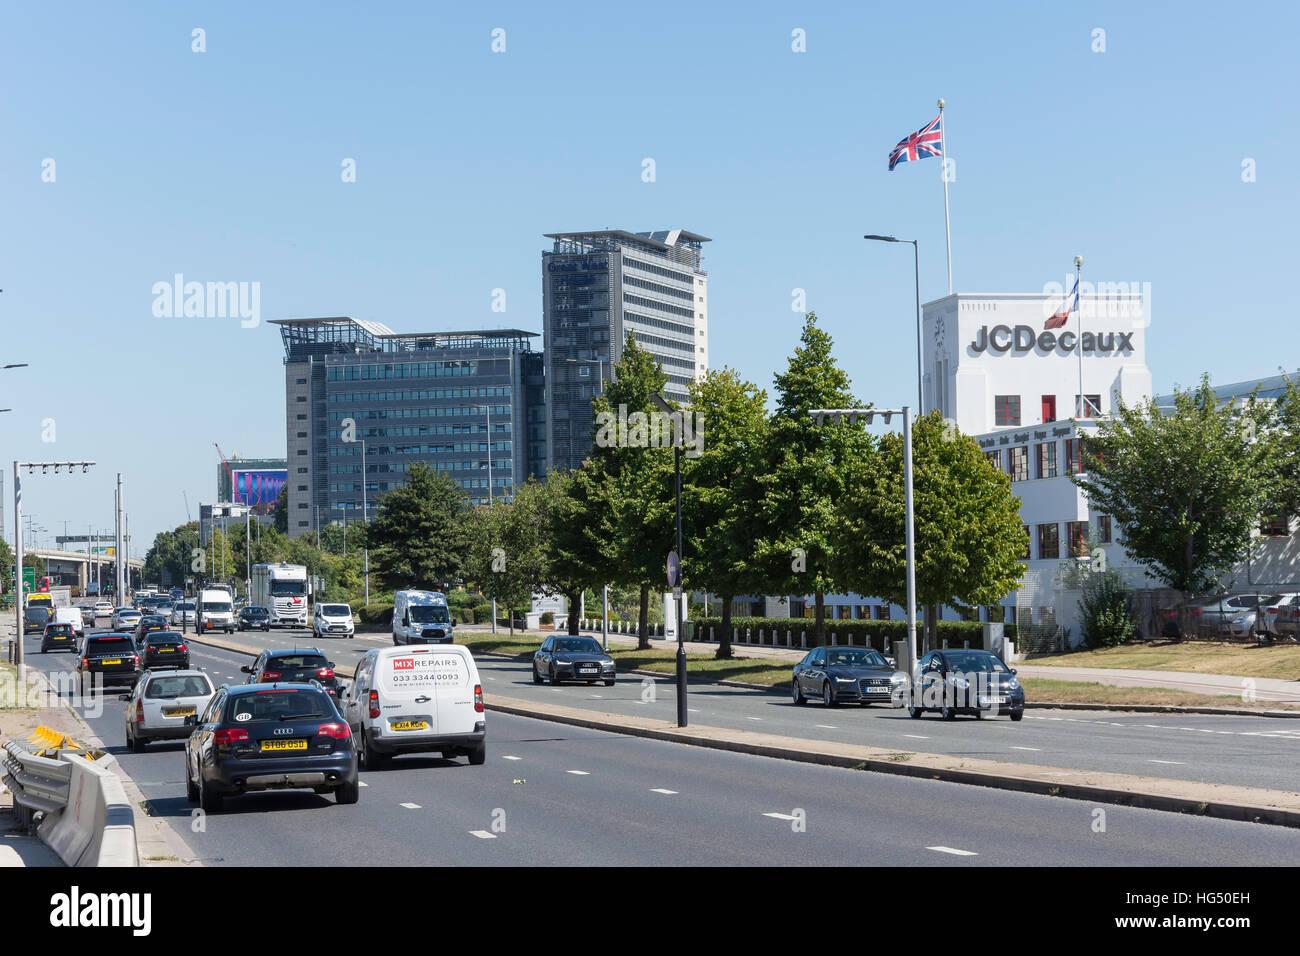 Great West Road, Brentford, London Borough of Hounslow, Greater London, England, United Kingdom Stock Photo